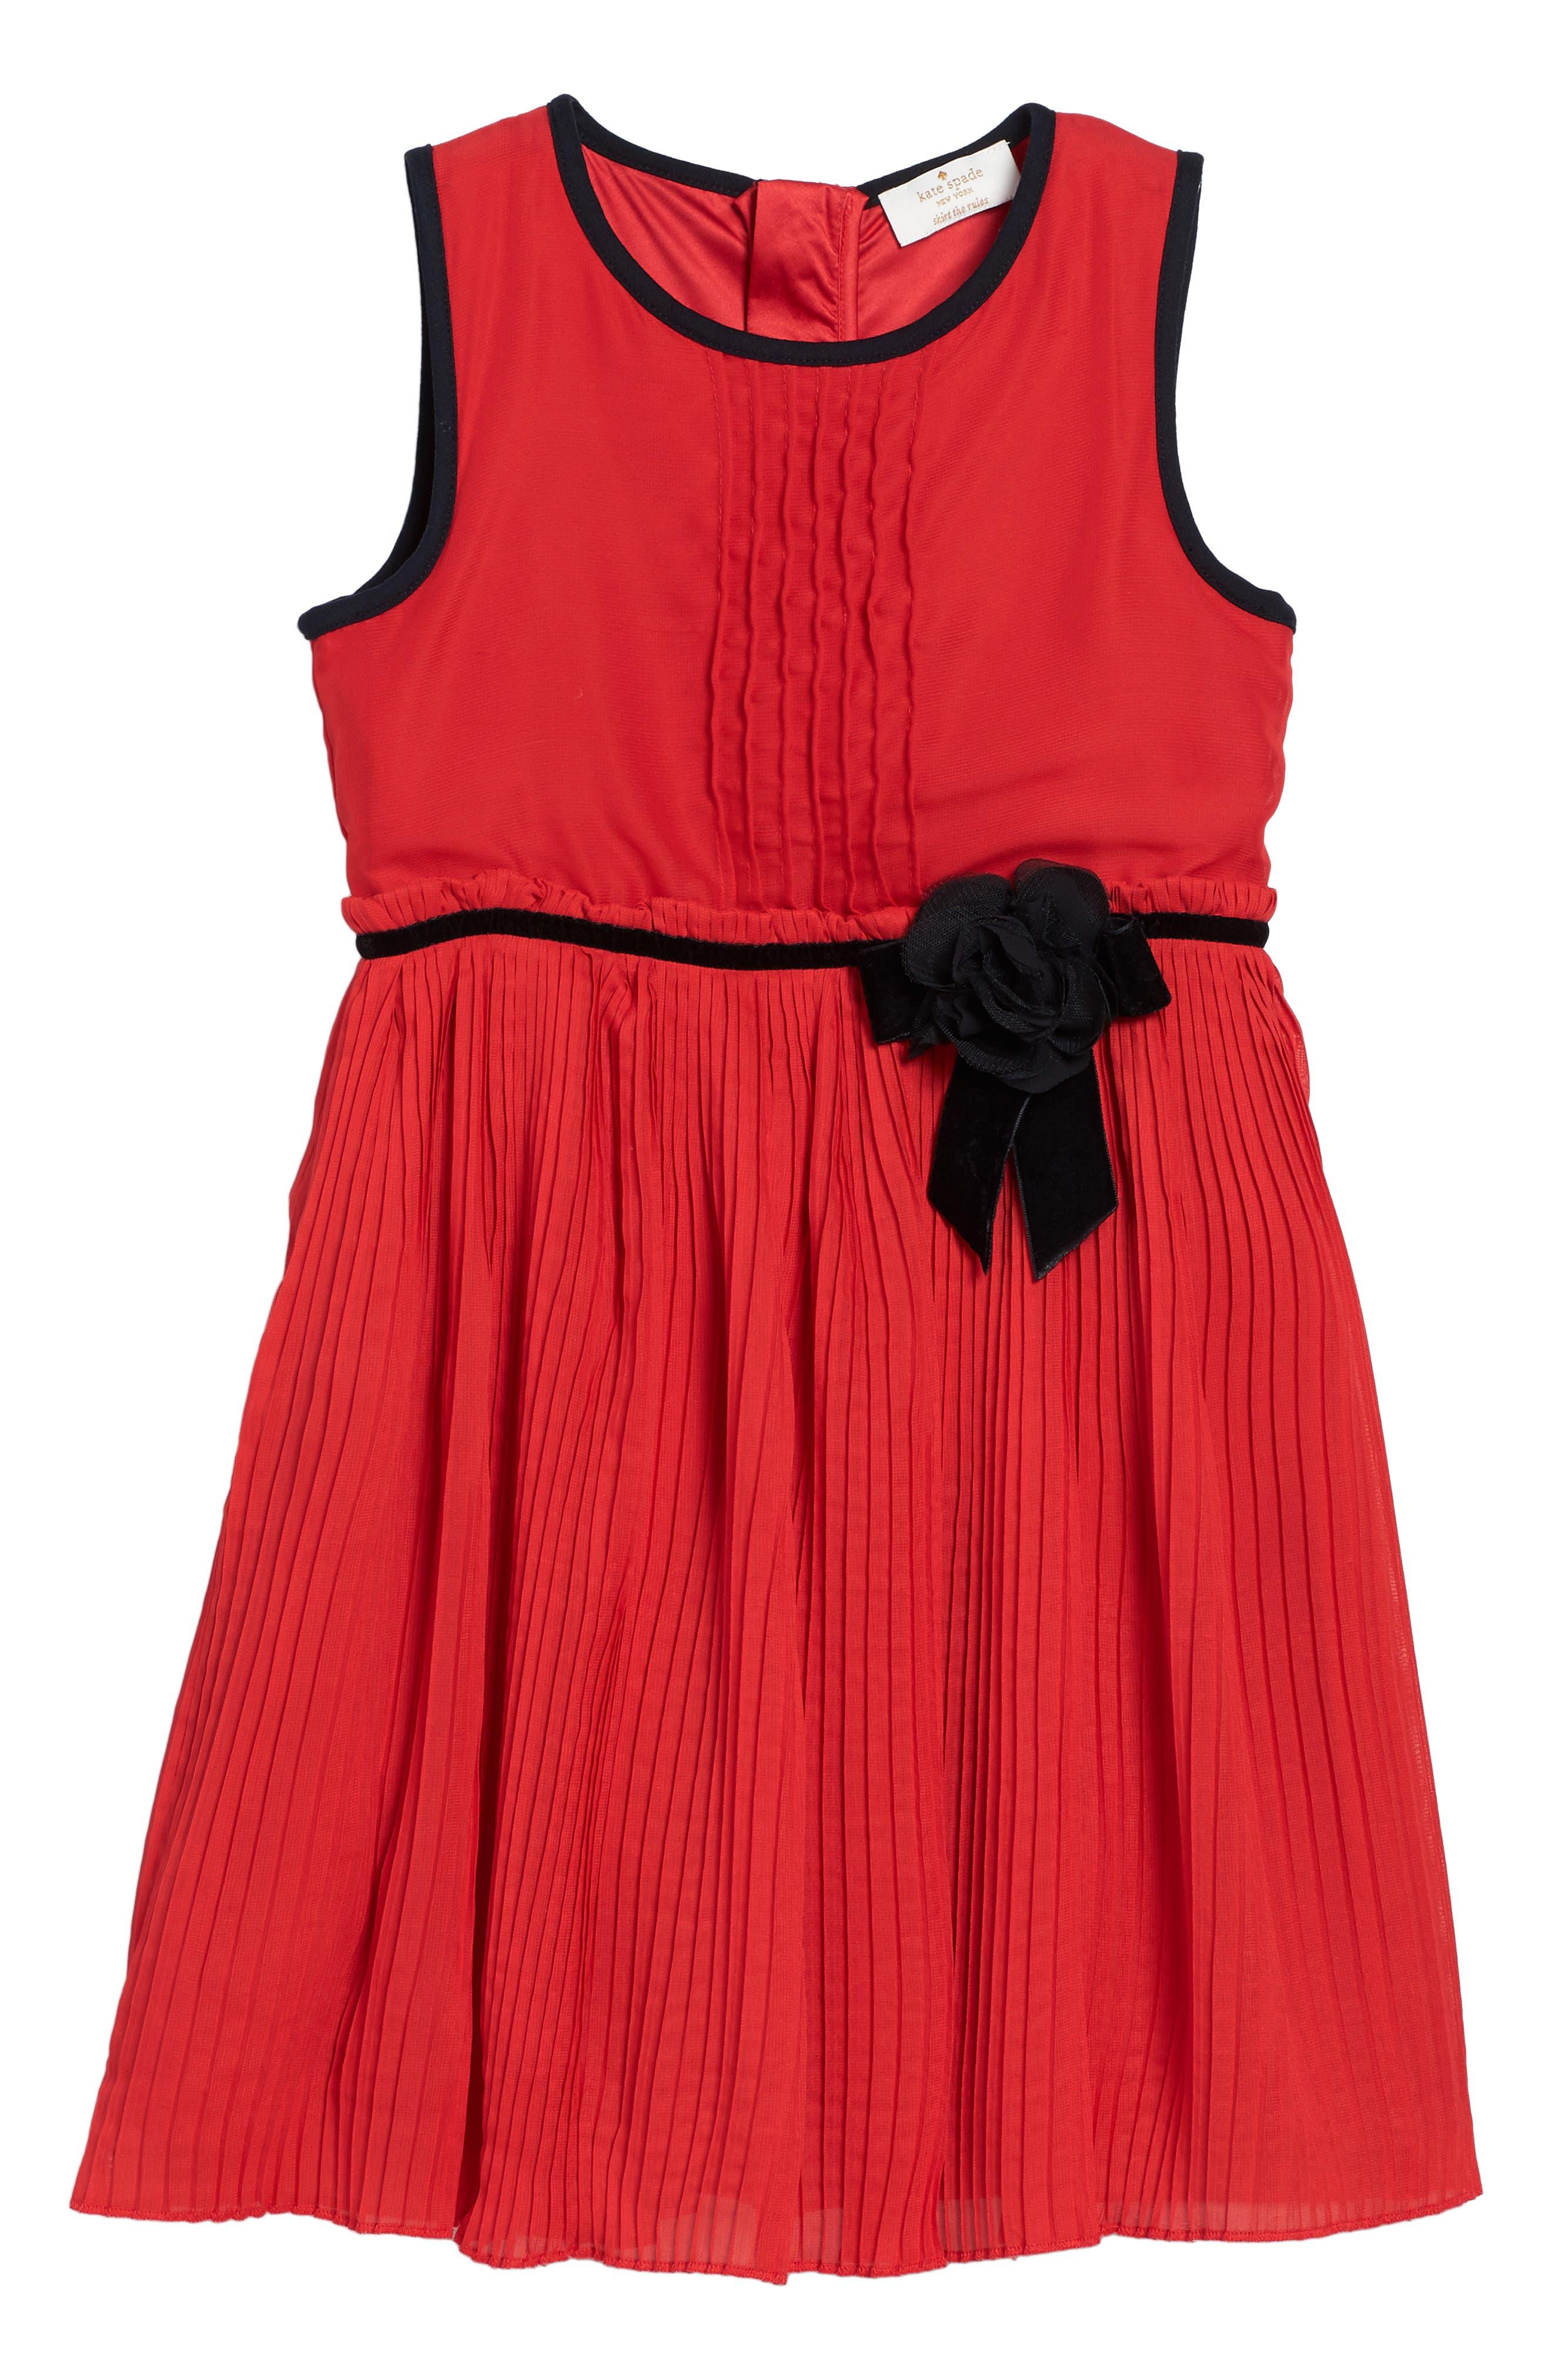 kate spade new york pleated chiffon party dress (Big Girls)